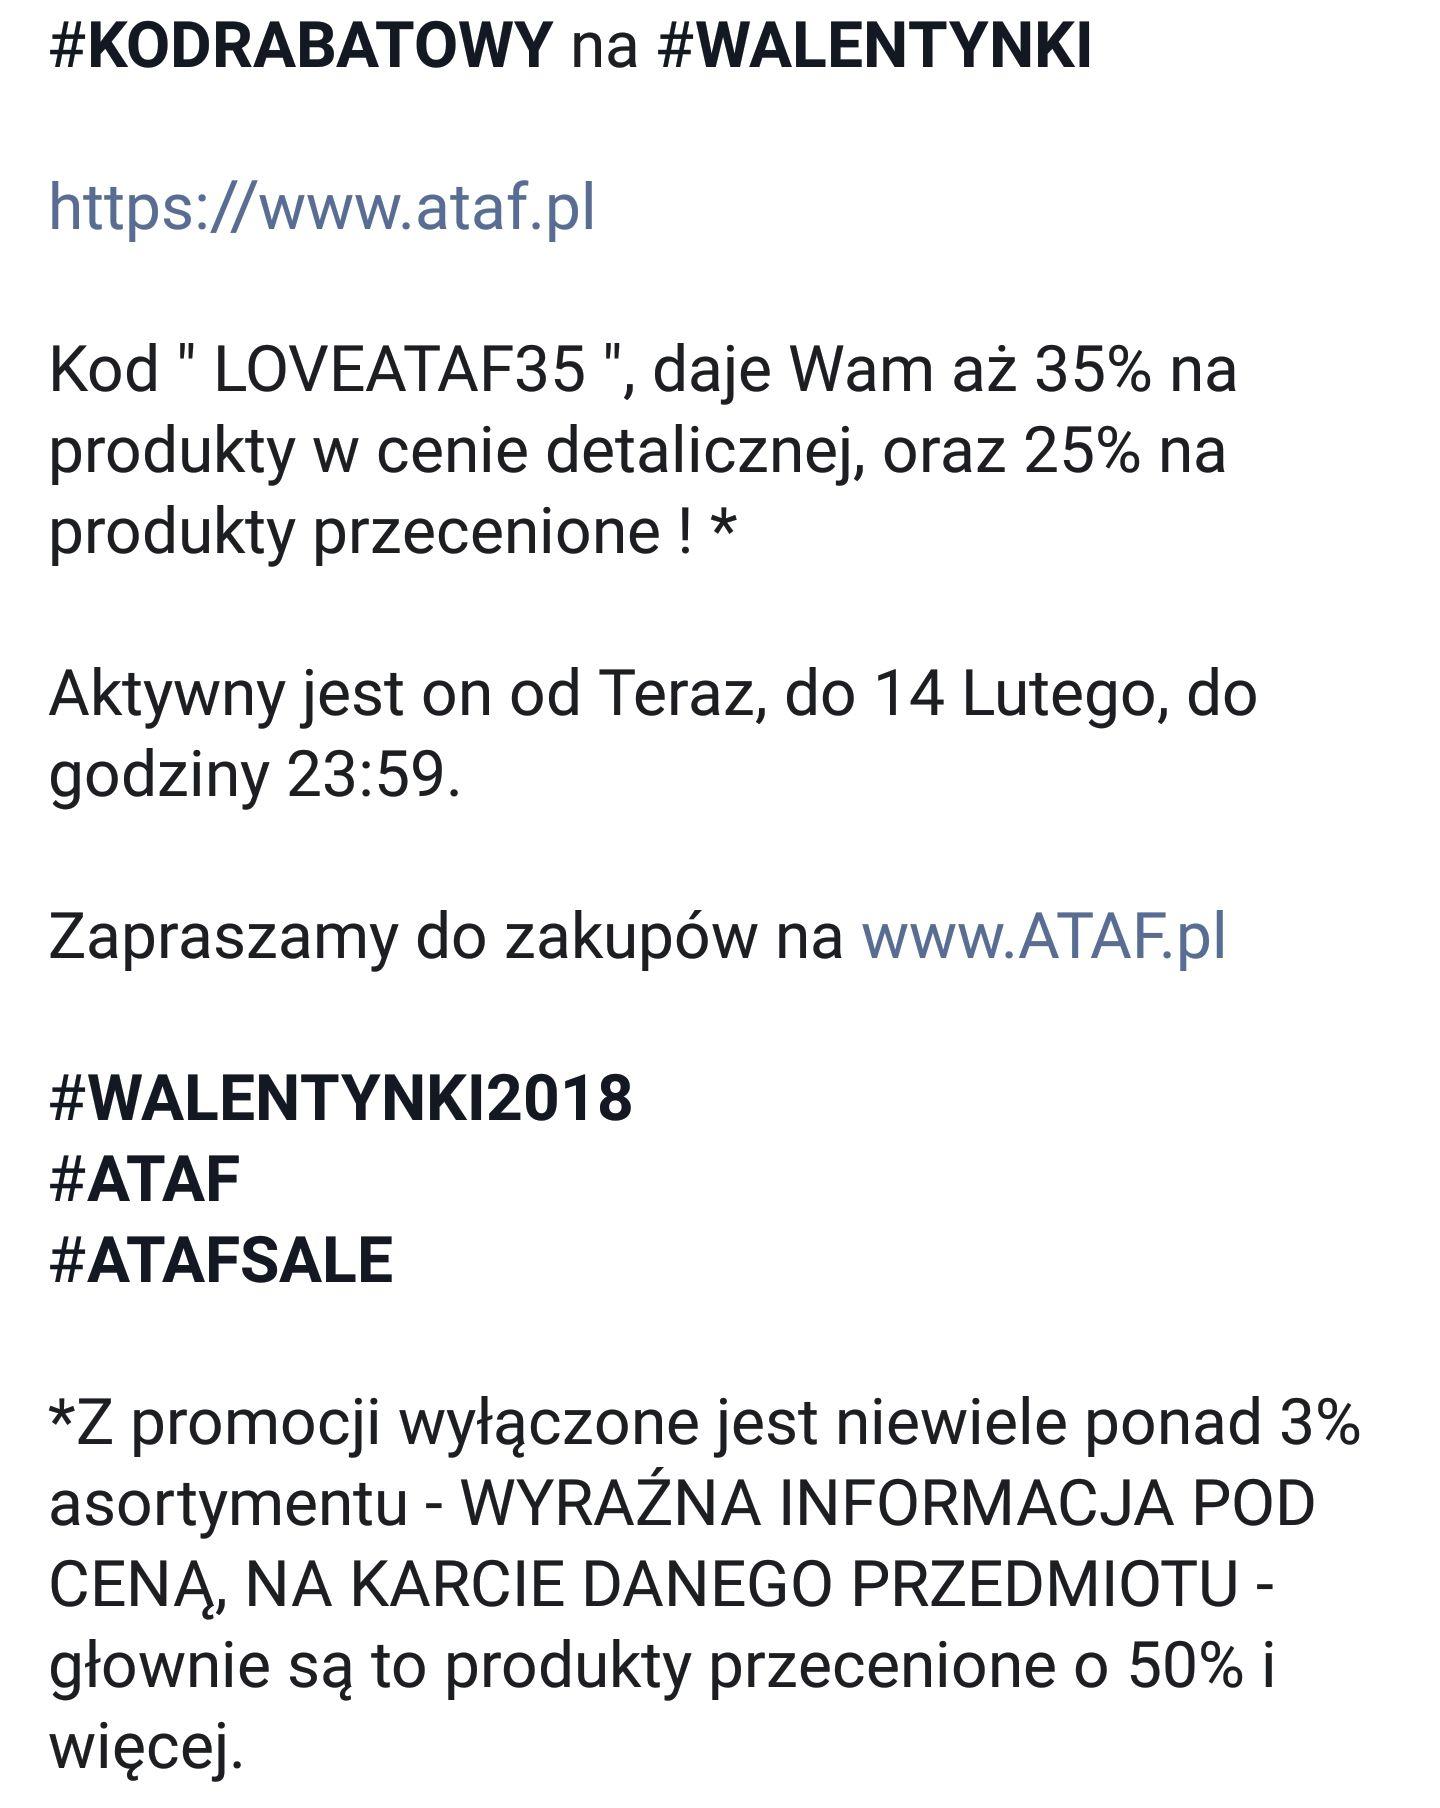 Kod rabatowy ATAF